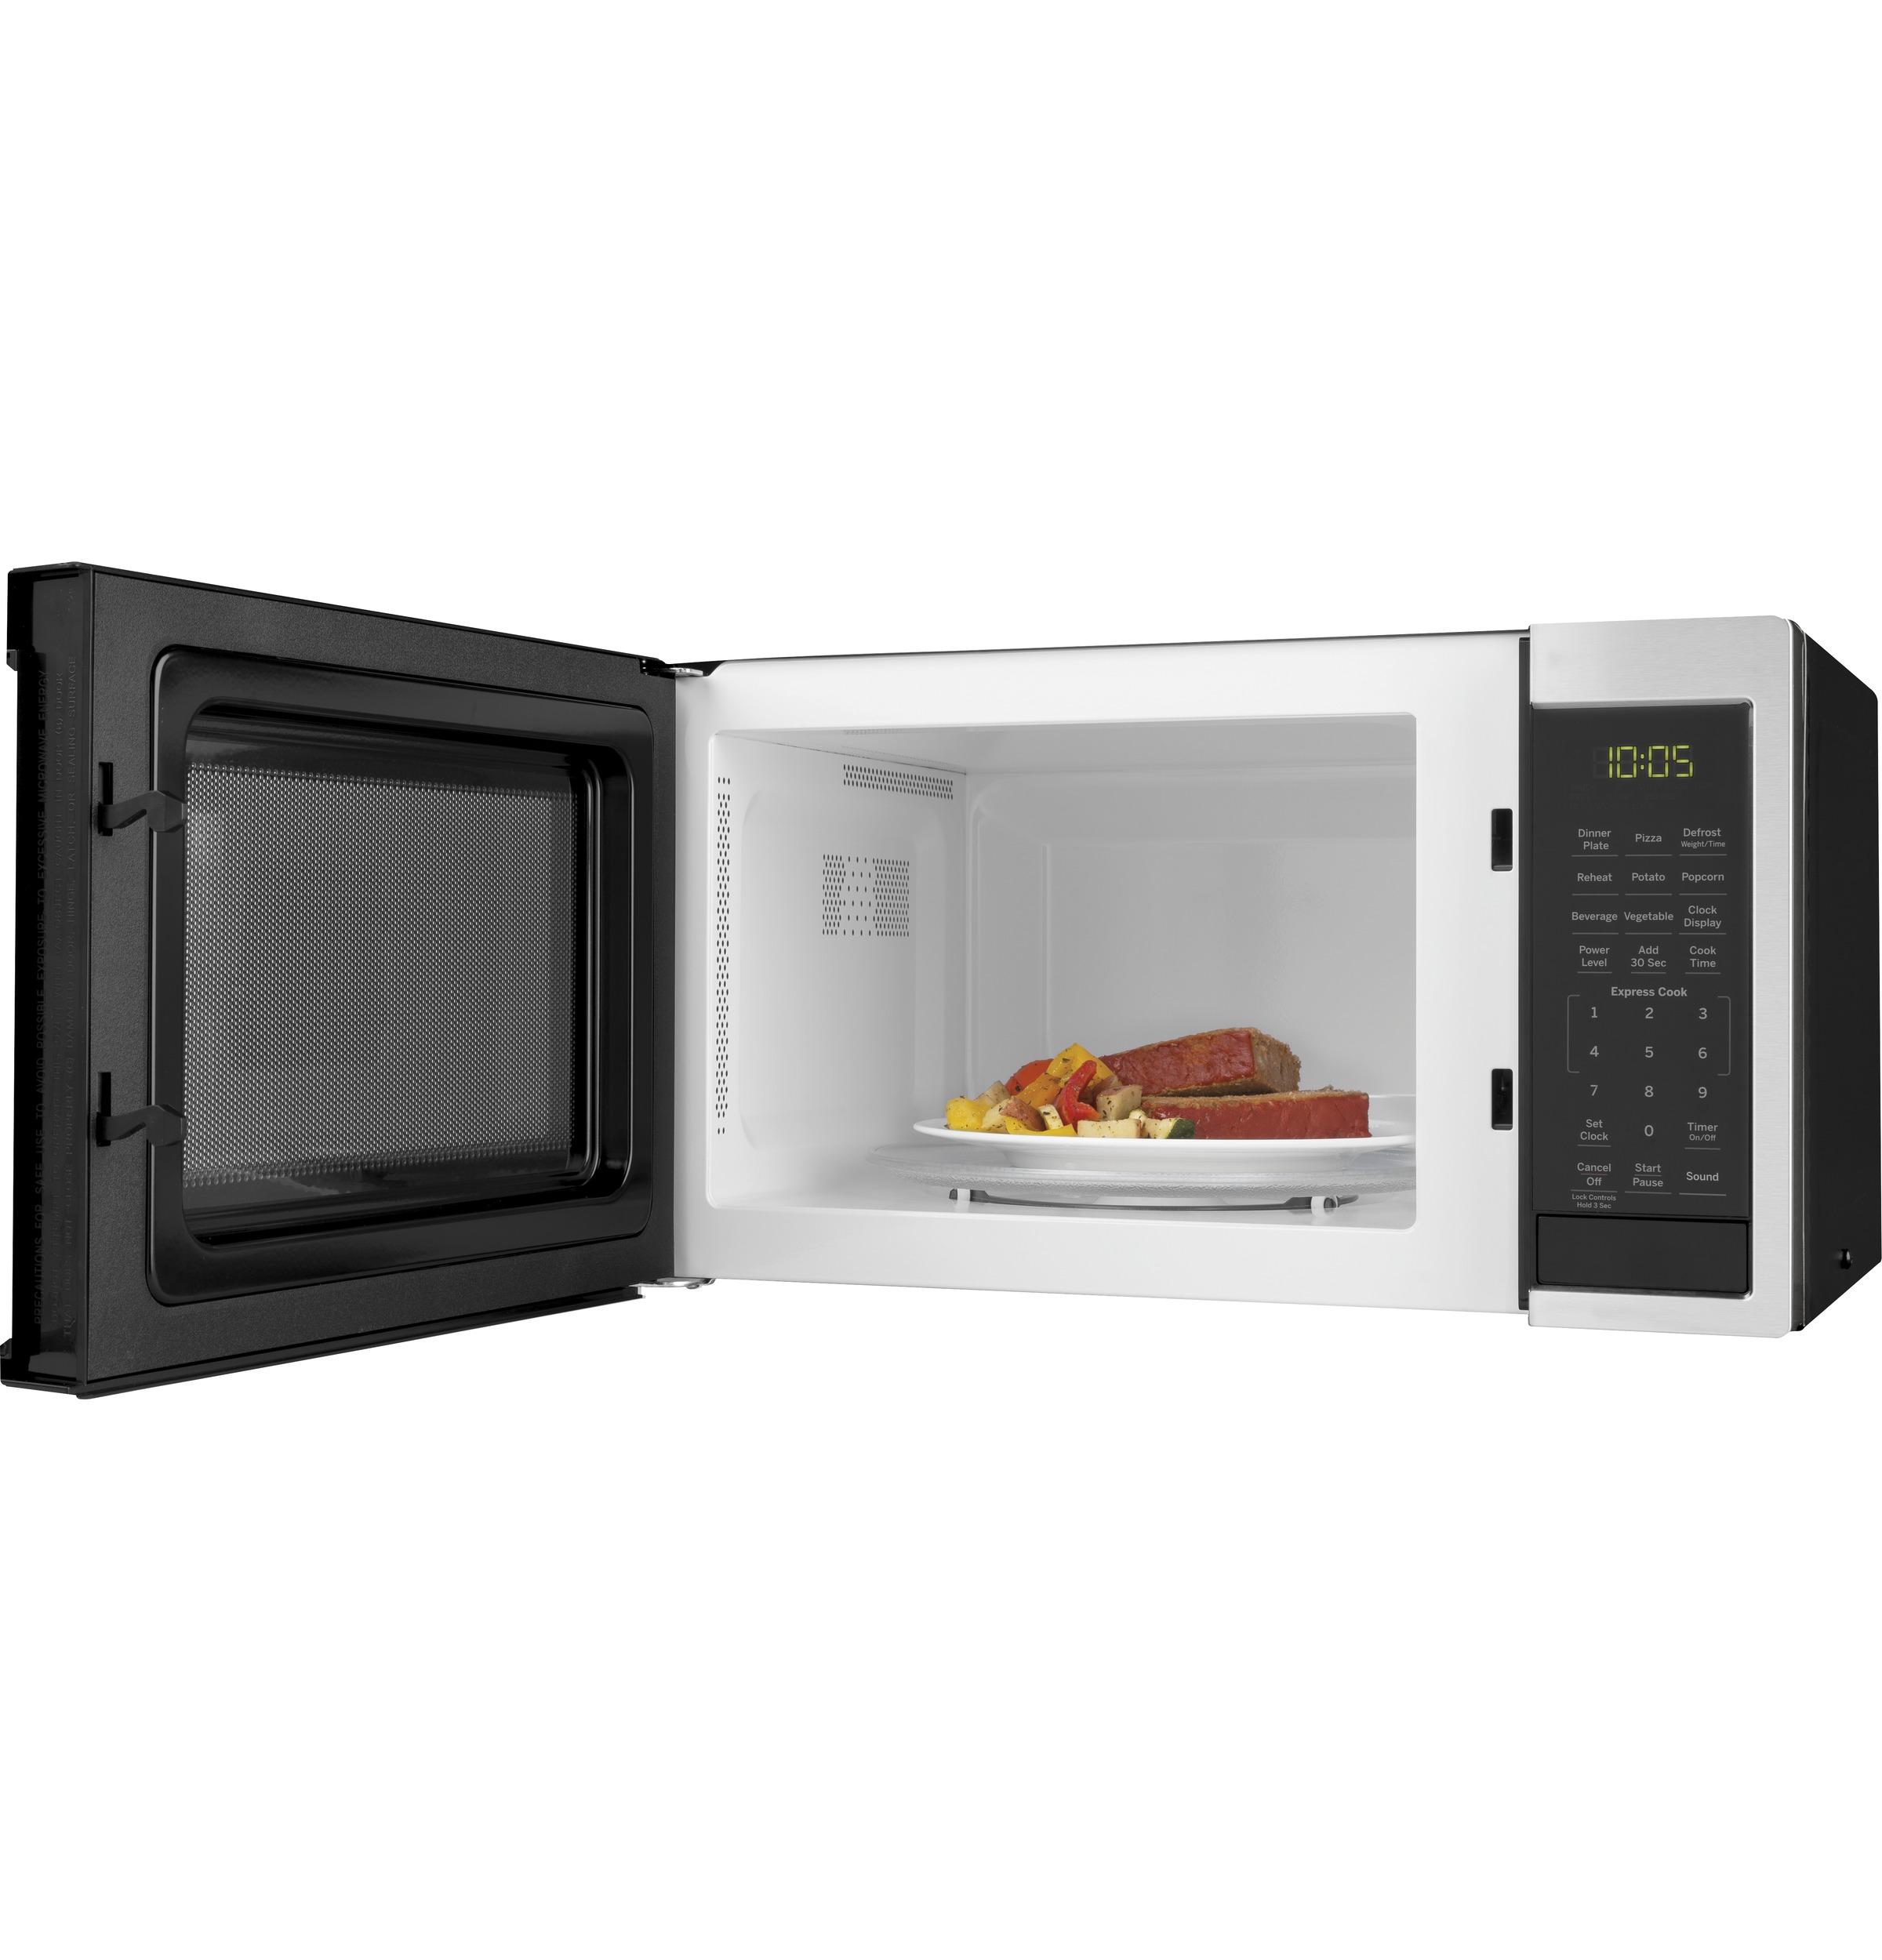 Model: JES1095SMSS | GE GE® 0.9 Cu. Ft. Capacity Countertop Microwave Oven